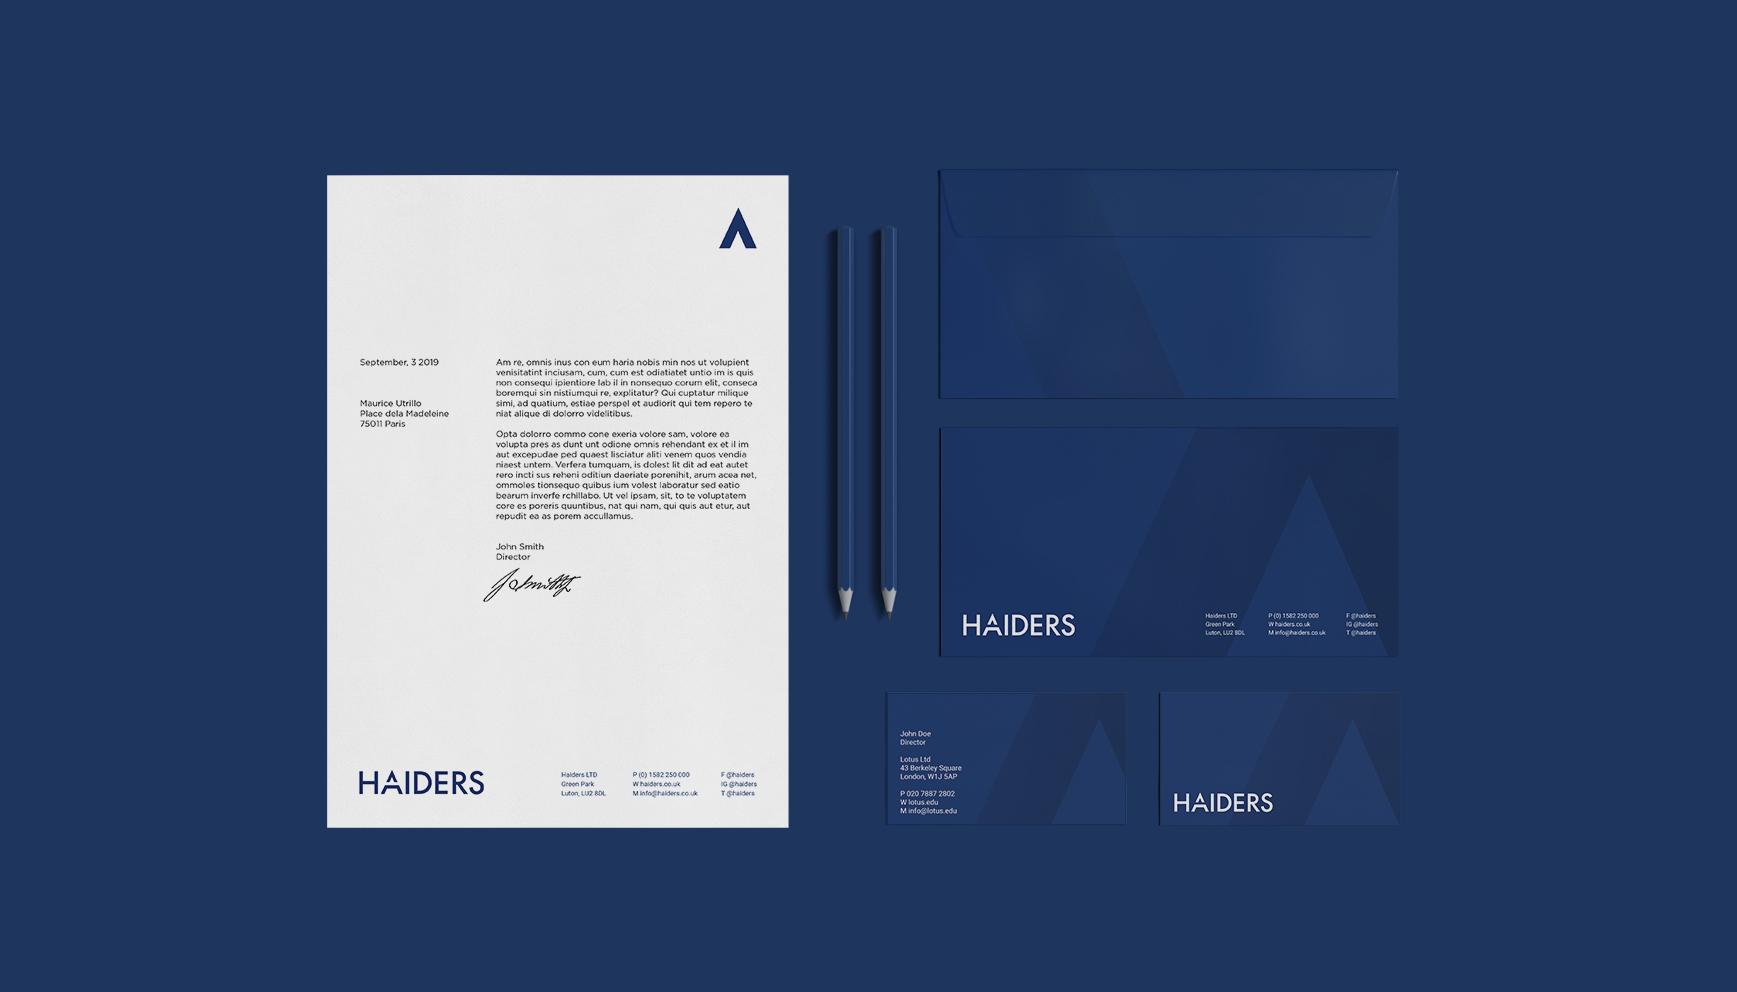 haiders-accountants-logo-identity-london.jpg